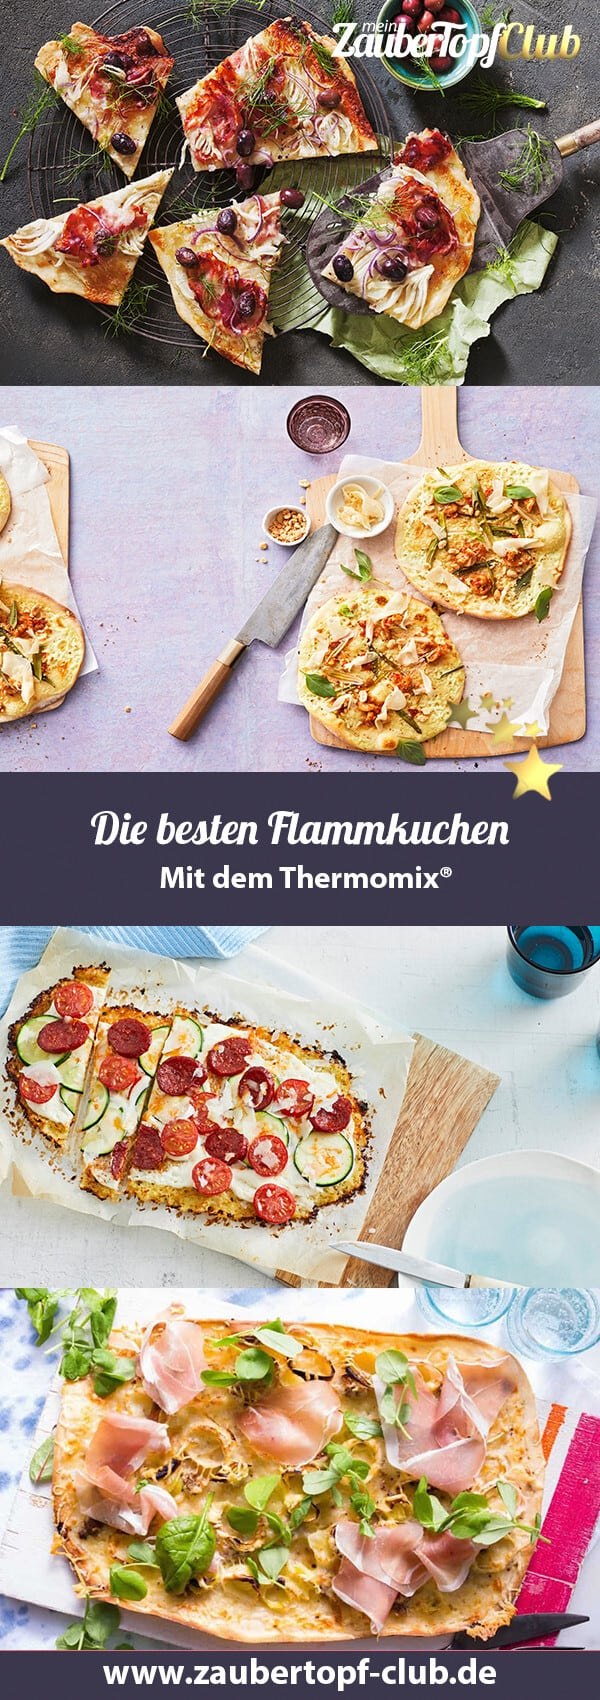 Flammkuchen mit dem Thermomix® – Fotos: Jorma Gottwald, Frauke Antholz, Ira Leoni